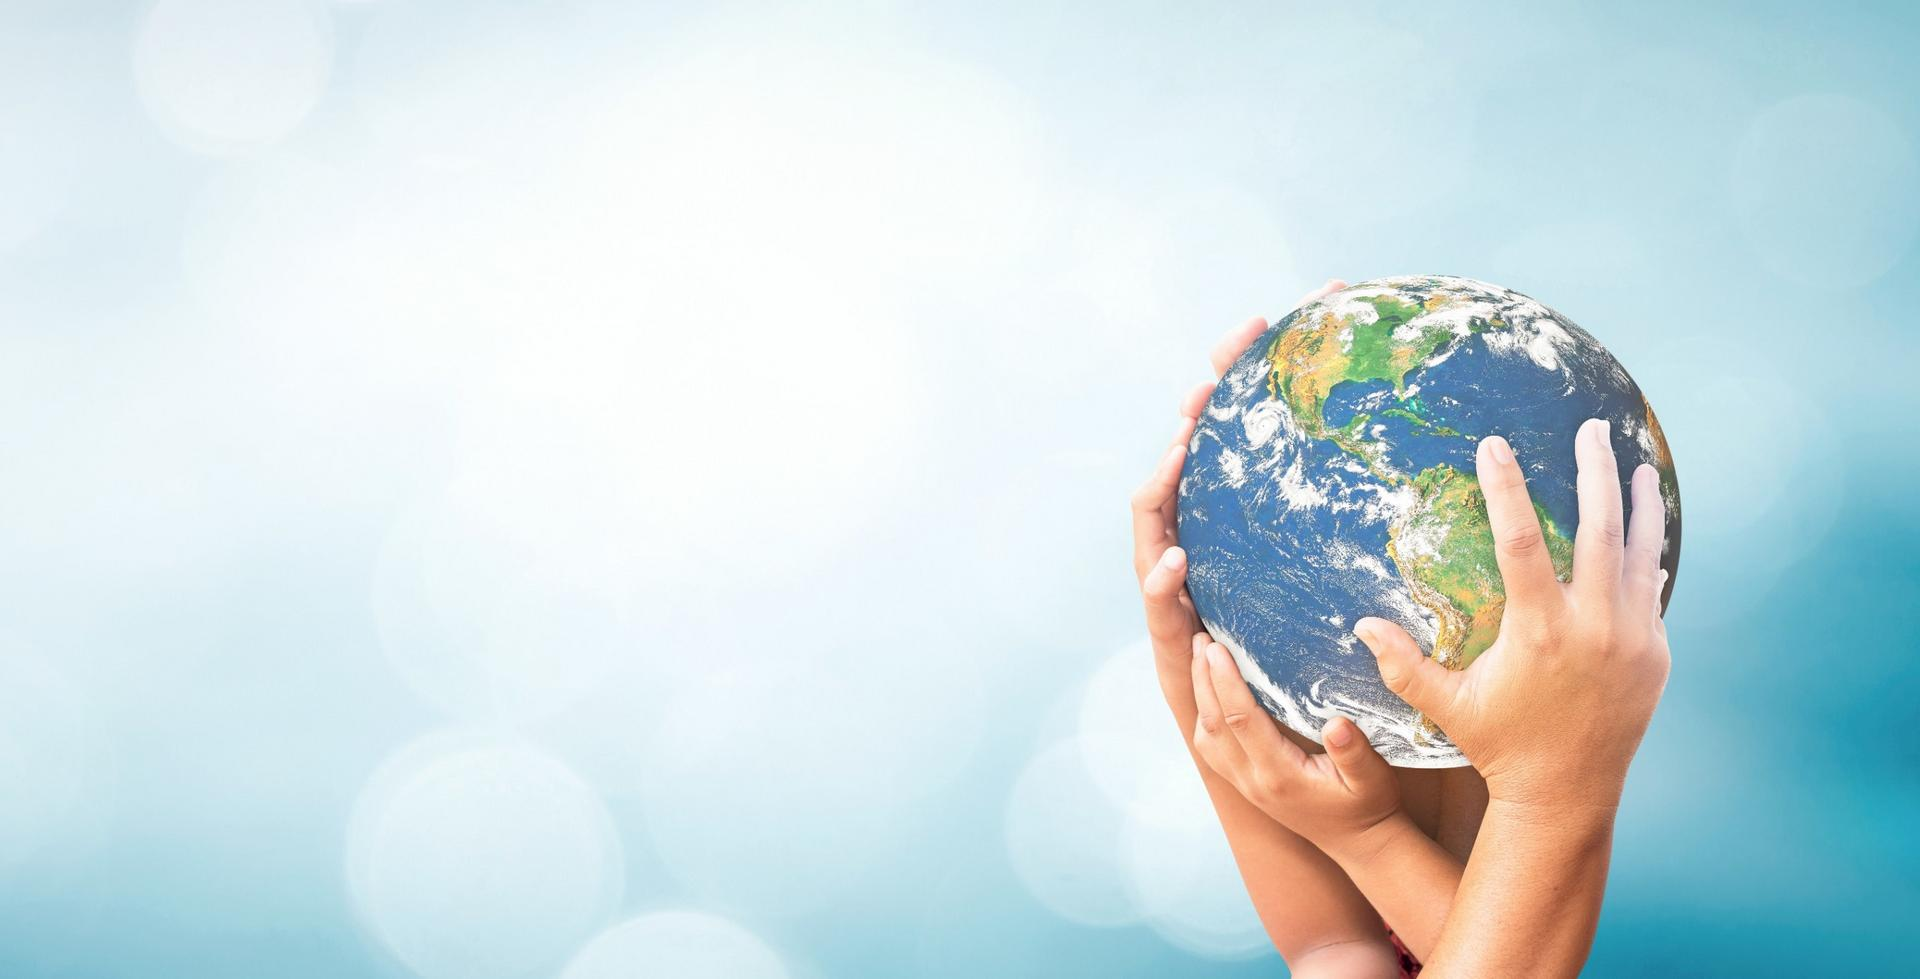 Hands holding globe on light blue background